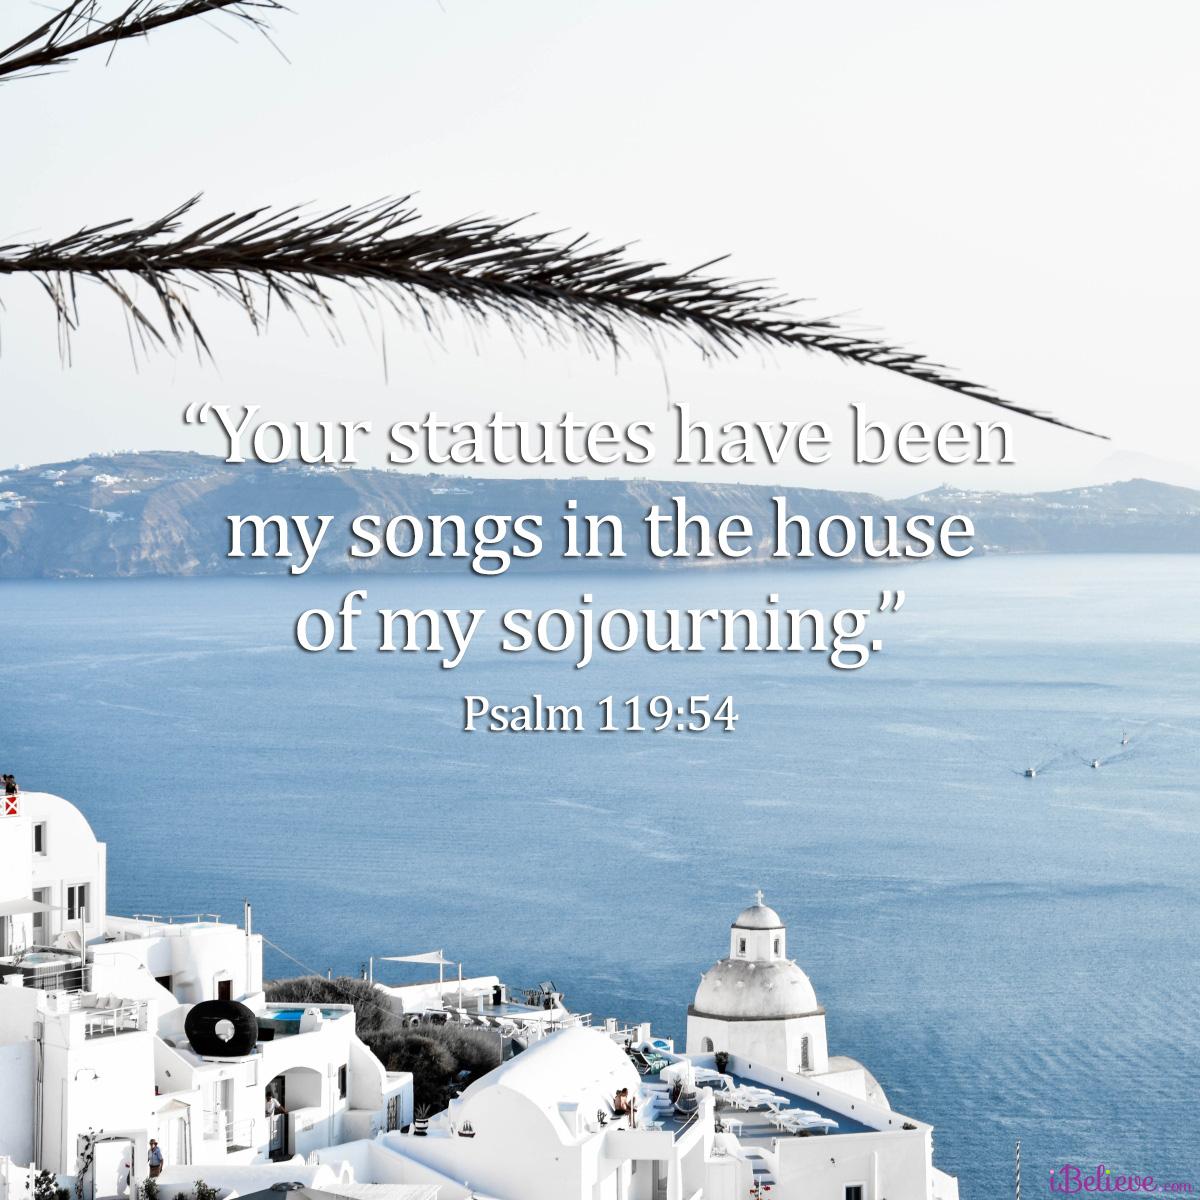 Psalm 119:54, inspirational image